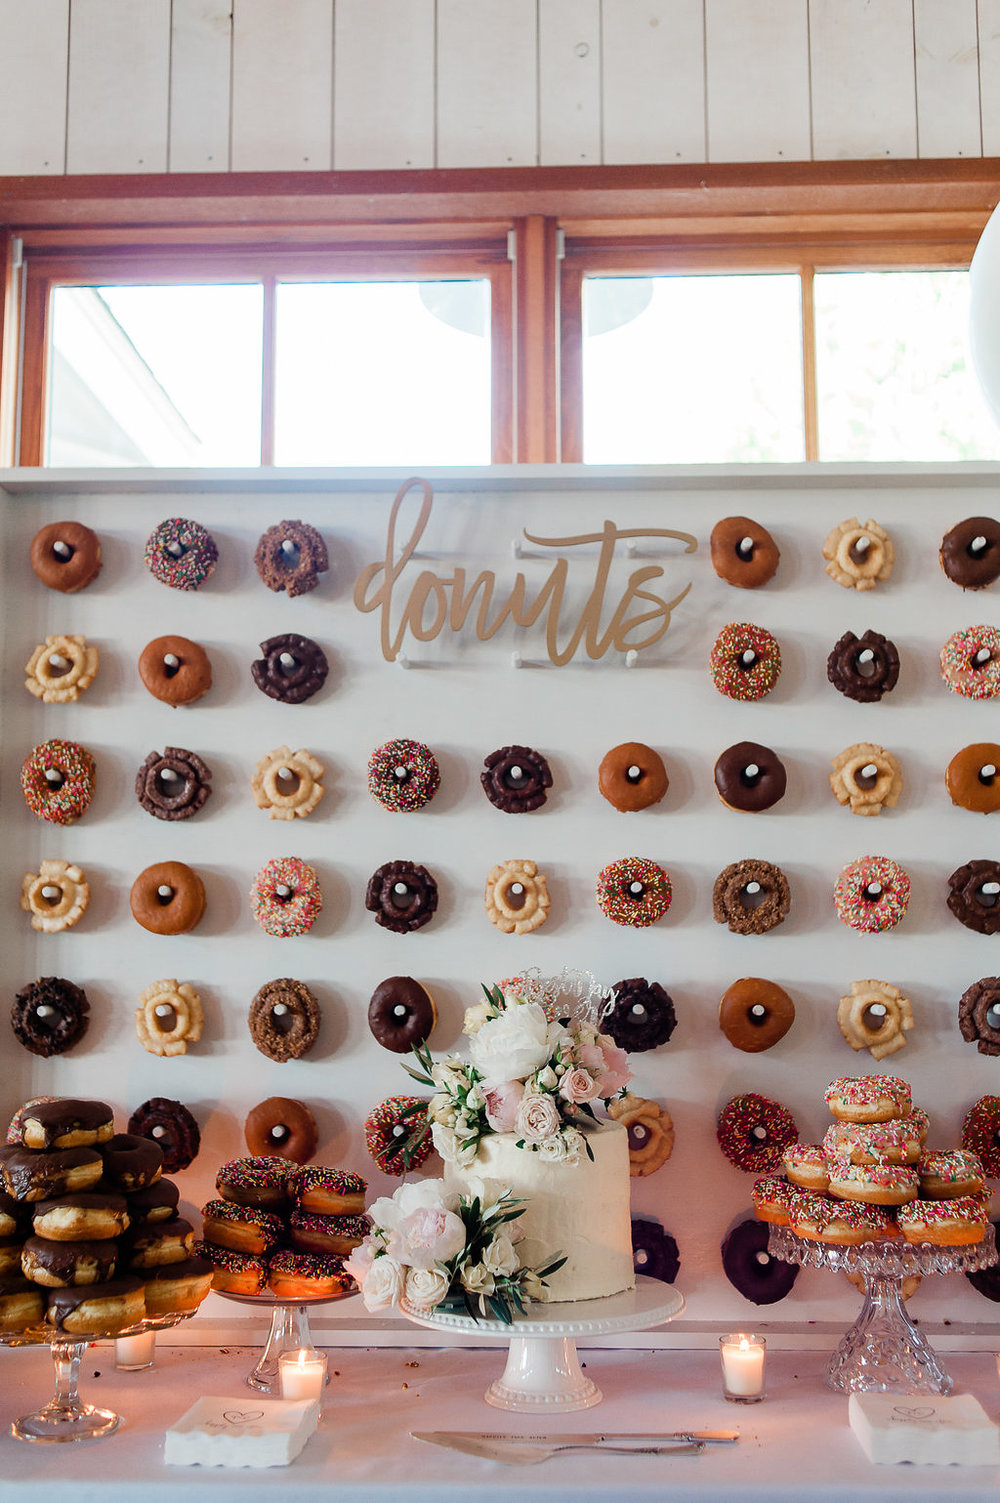 Park Winters Summer Wedding | Wedding Dessert | Wedding Donuts | Donut Wall | Unique Wedding Dessert Ideas | Two-tier wedding cake